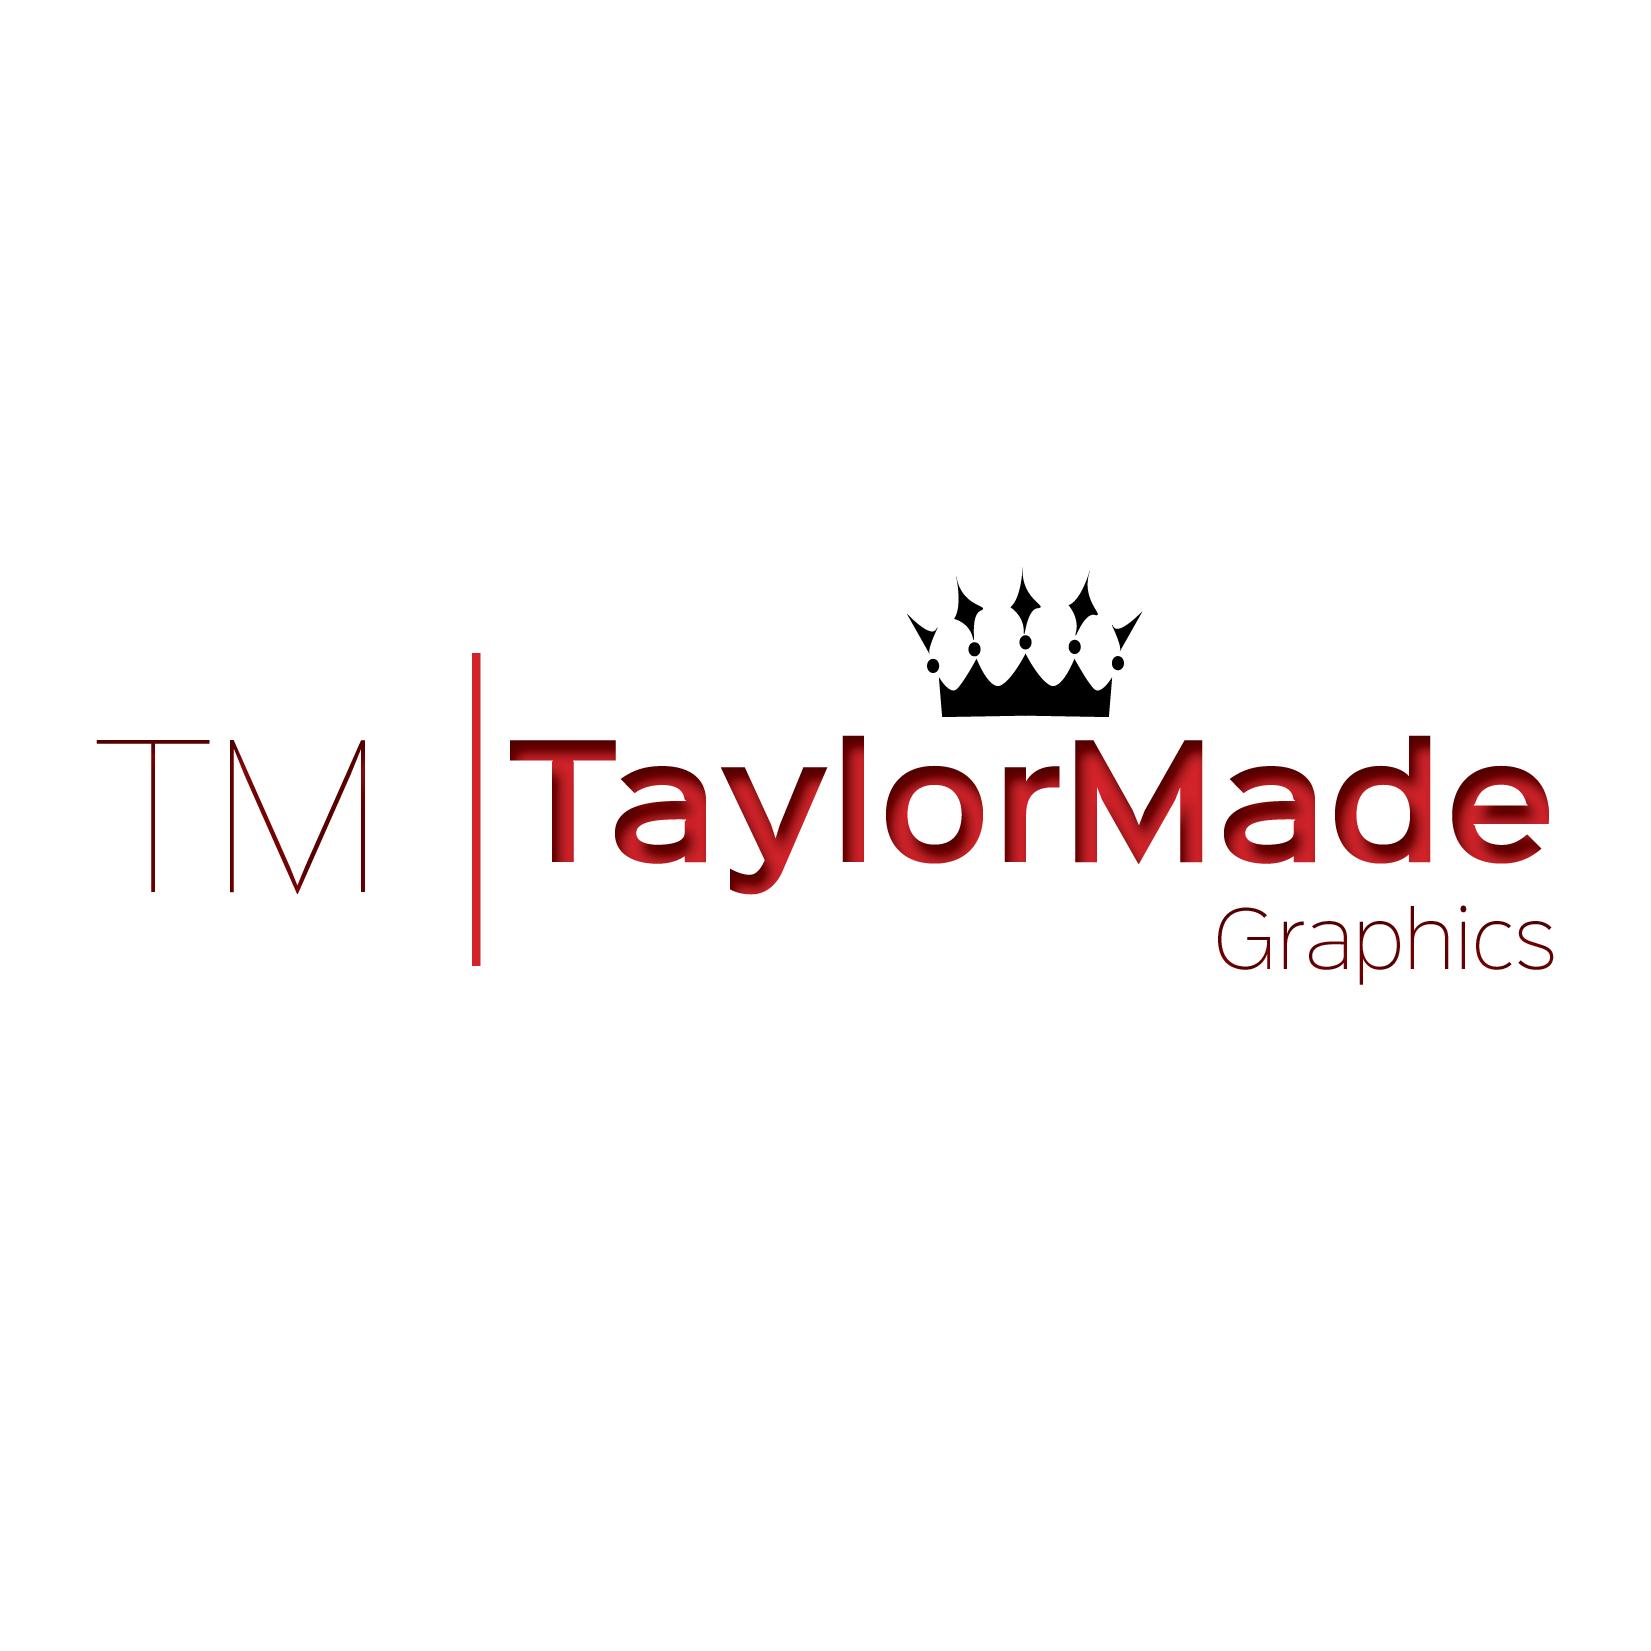 Graphic design work by Crystal Dayton